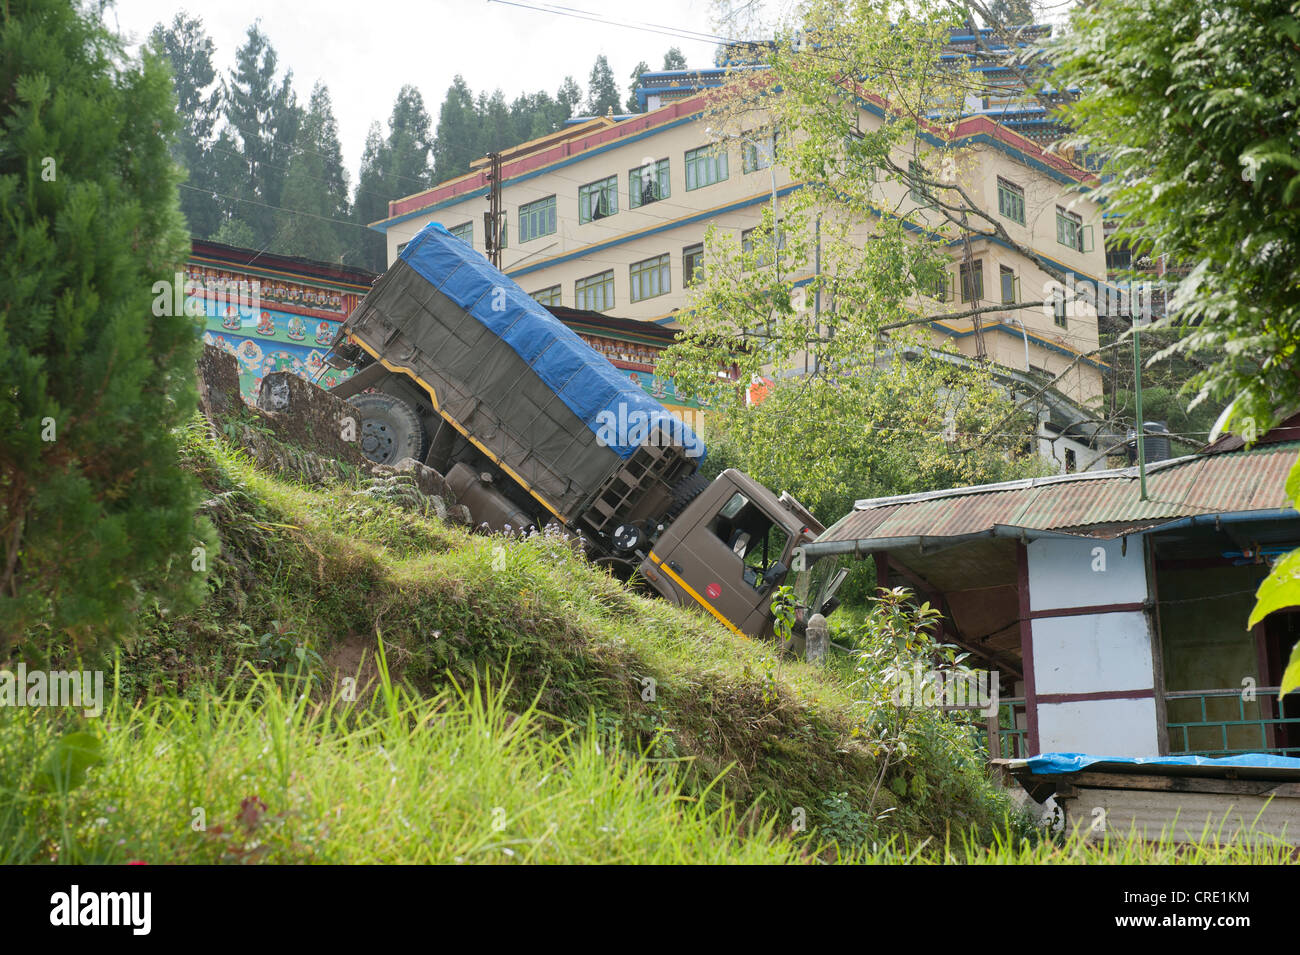 Accident, truck having crashed down a slope, Rumtek Monastery near Gangtok, Sikkim Himalayas, India, South Asia, - Stock Image